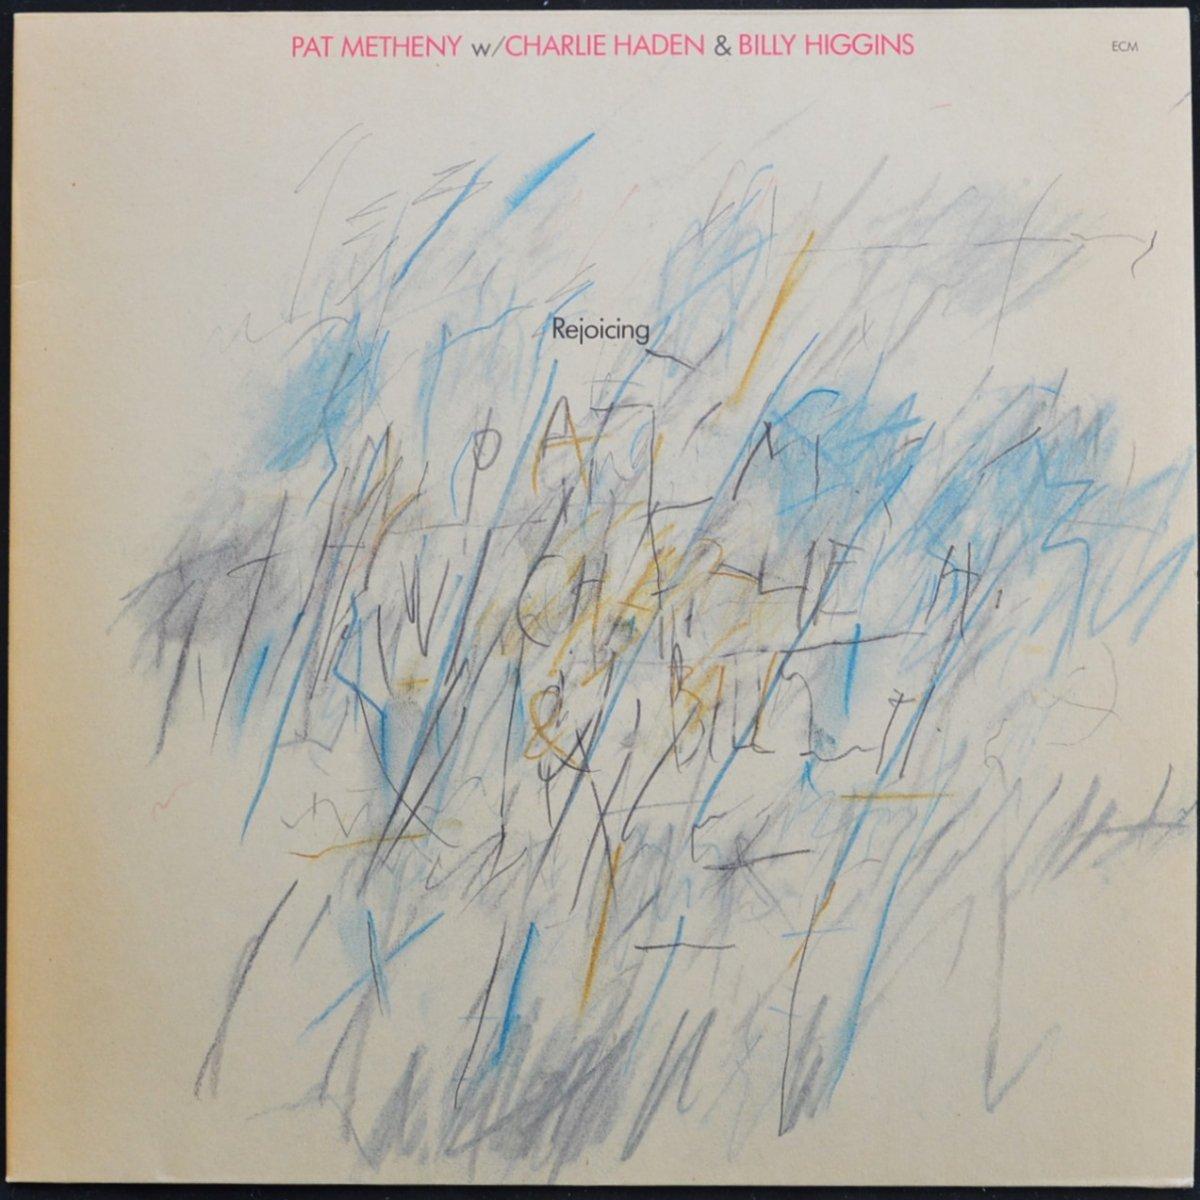 PAT METHENY W/ CHARLIE HADEN & BILLY HIGGINS / REJOICING (LP)